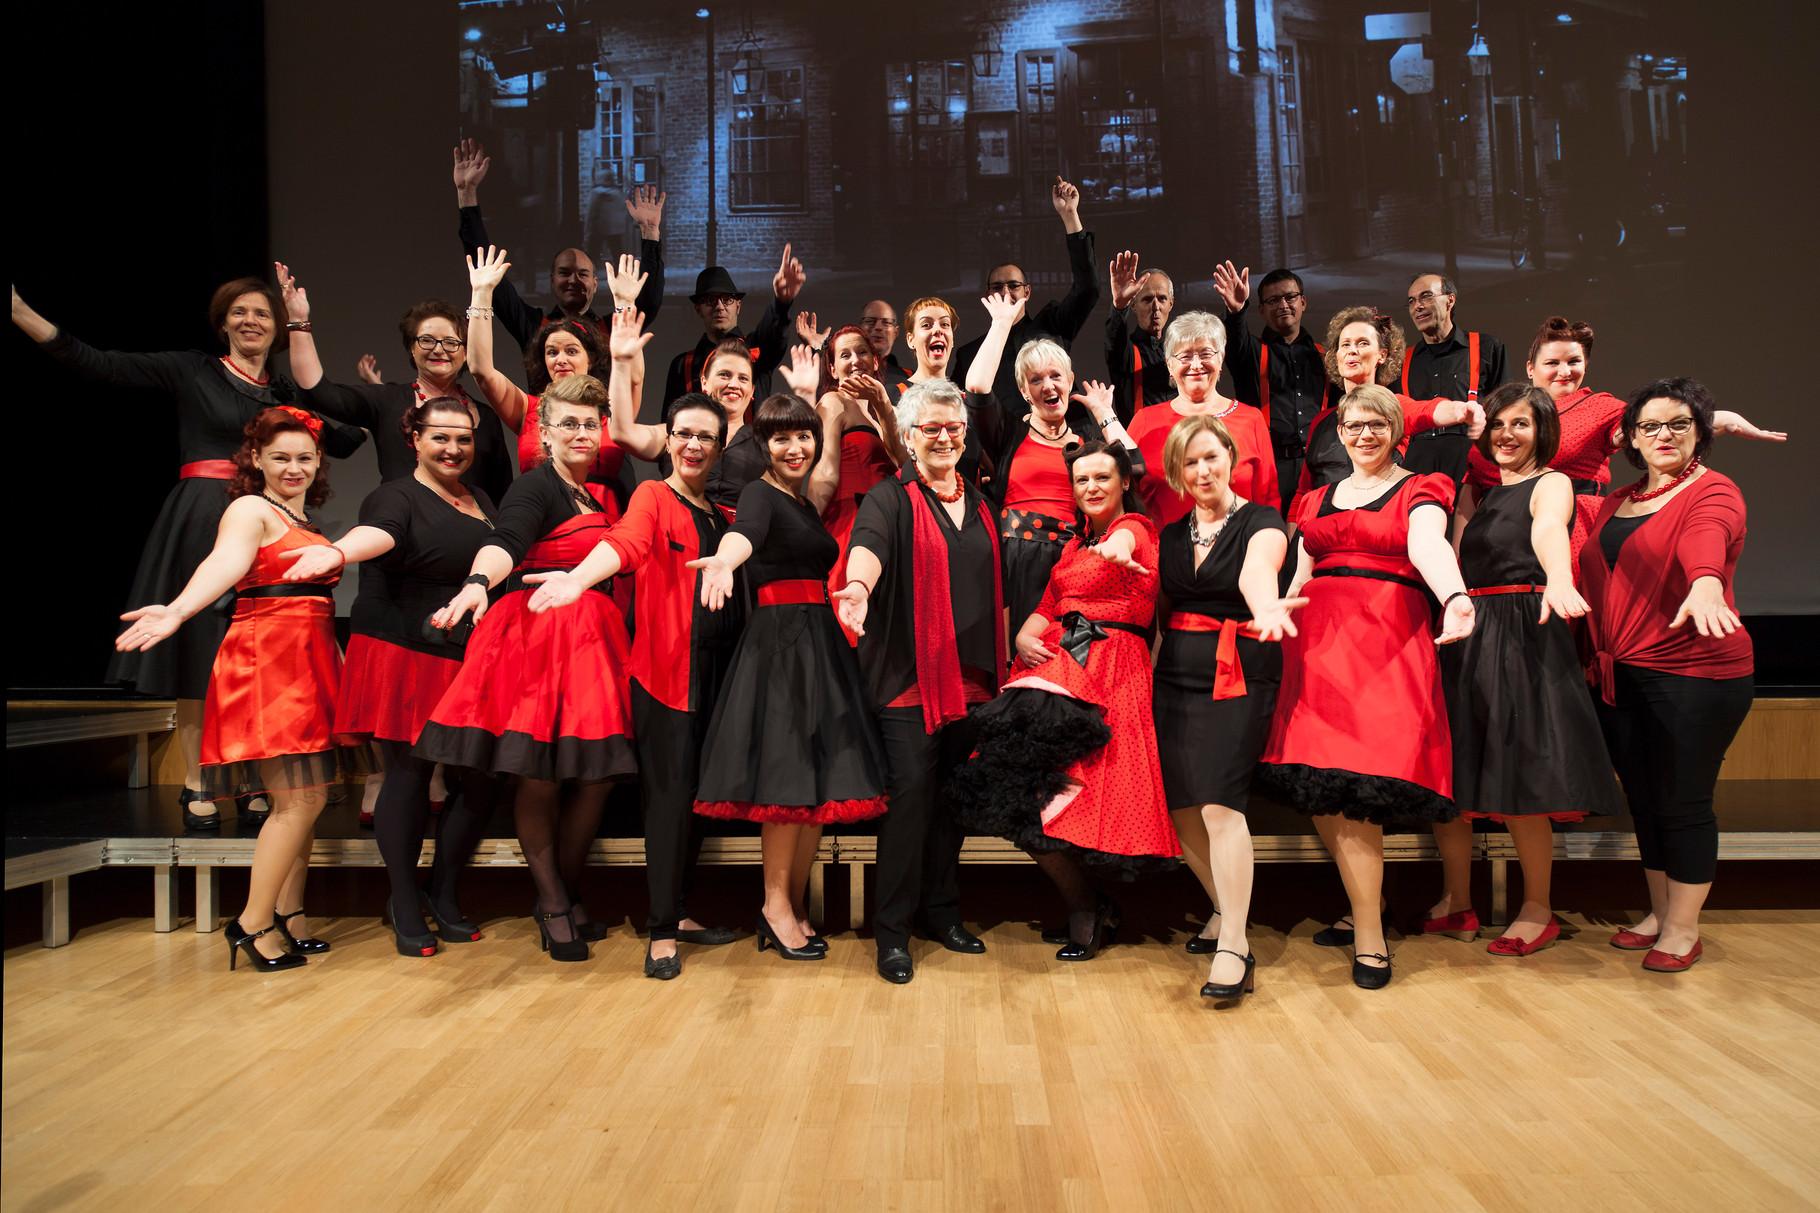 Konzert Dezember 2015, AMBACH, Götzis